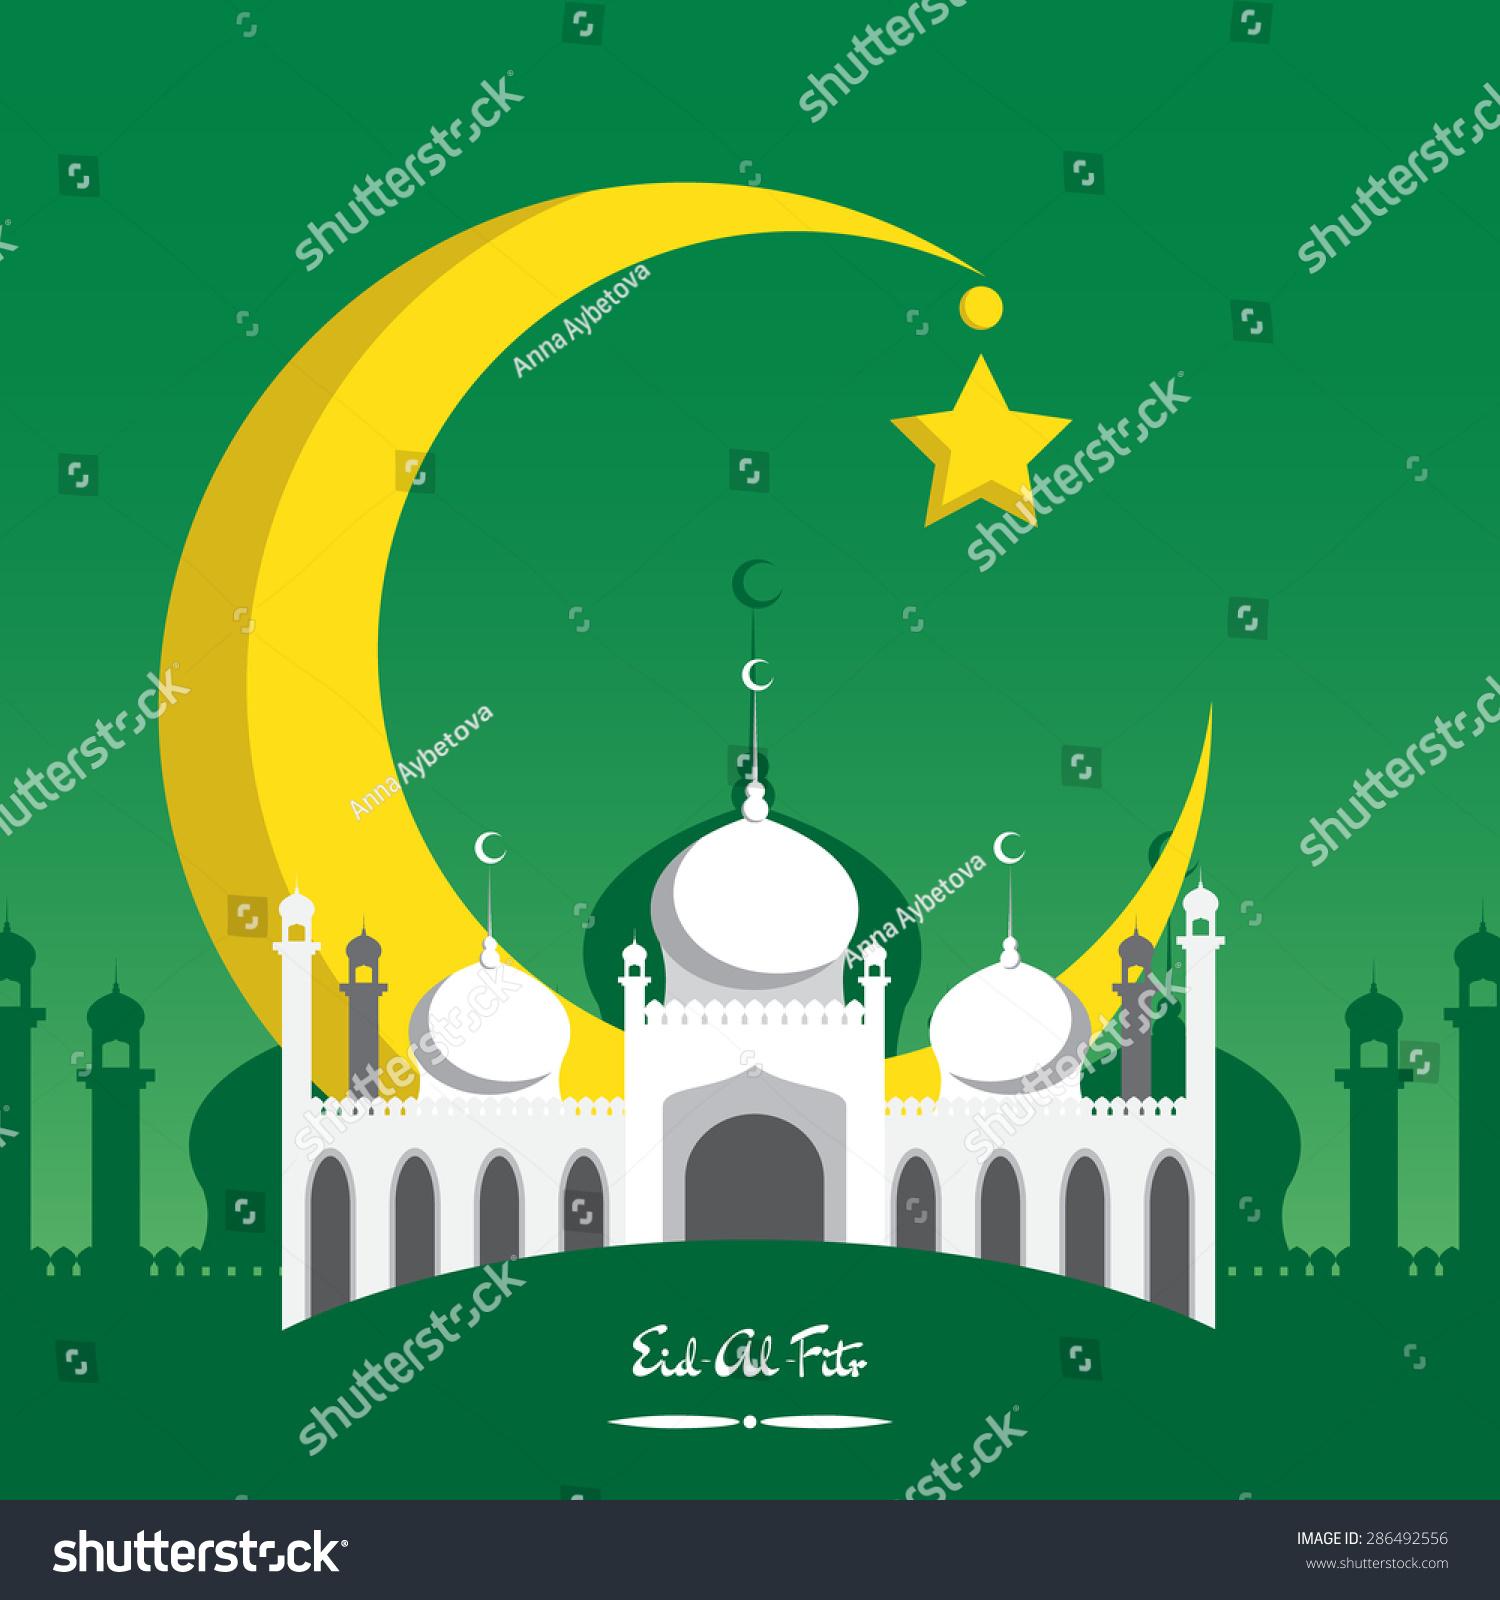 Great Id Festival Eid Al-Fitr Greeting - stock-vector-crescent-moon-for-muslim-community-festival-eid-al-fitr-mubarak-greeting-card-template-286492556  Pic_381069 .jpg